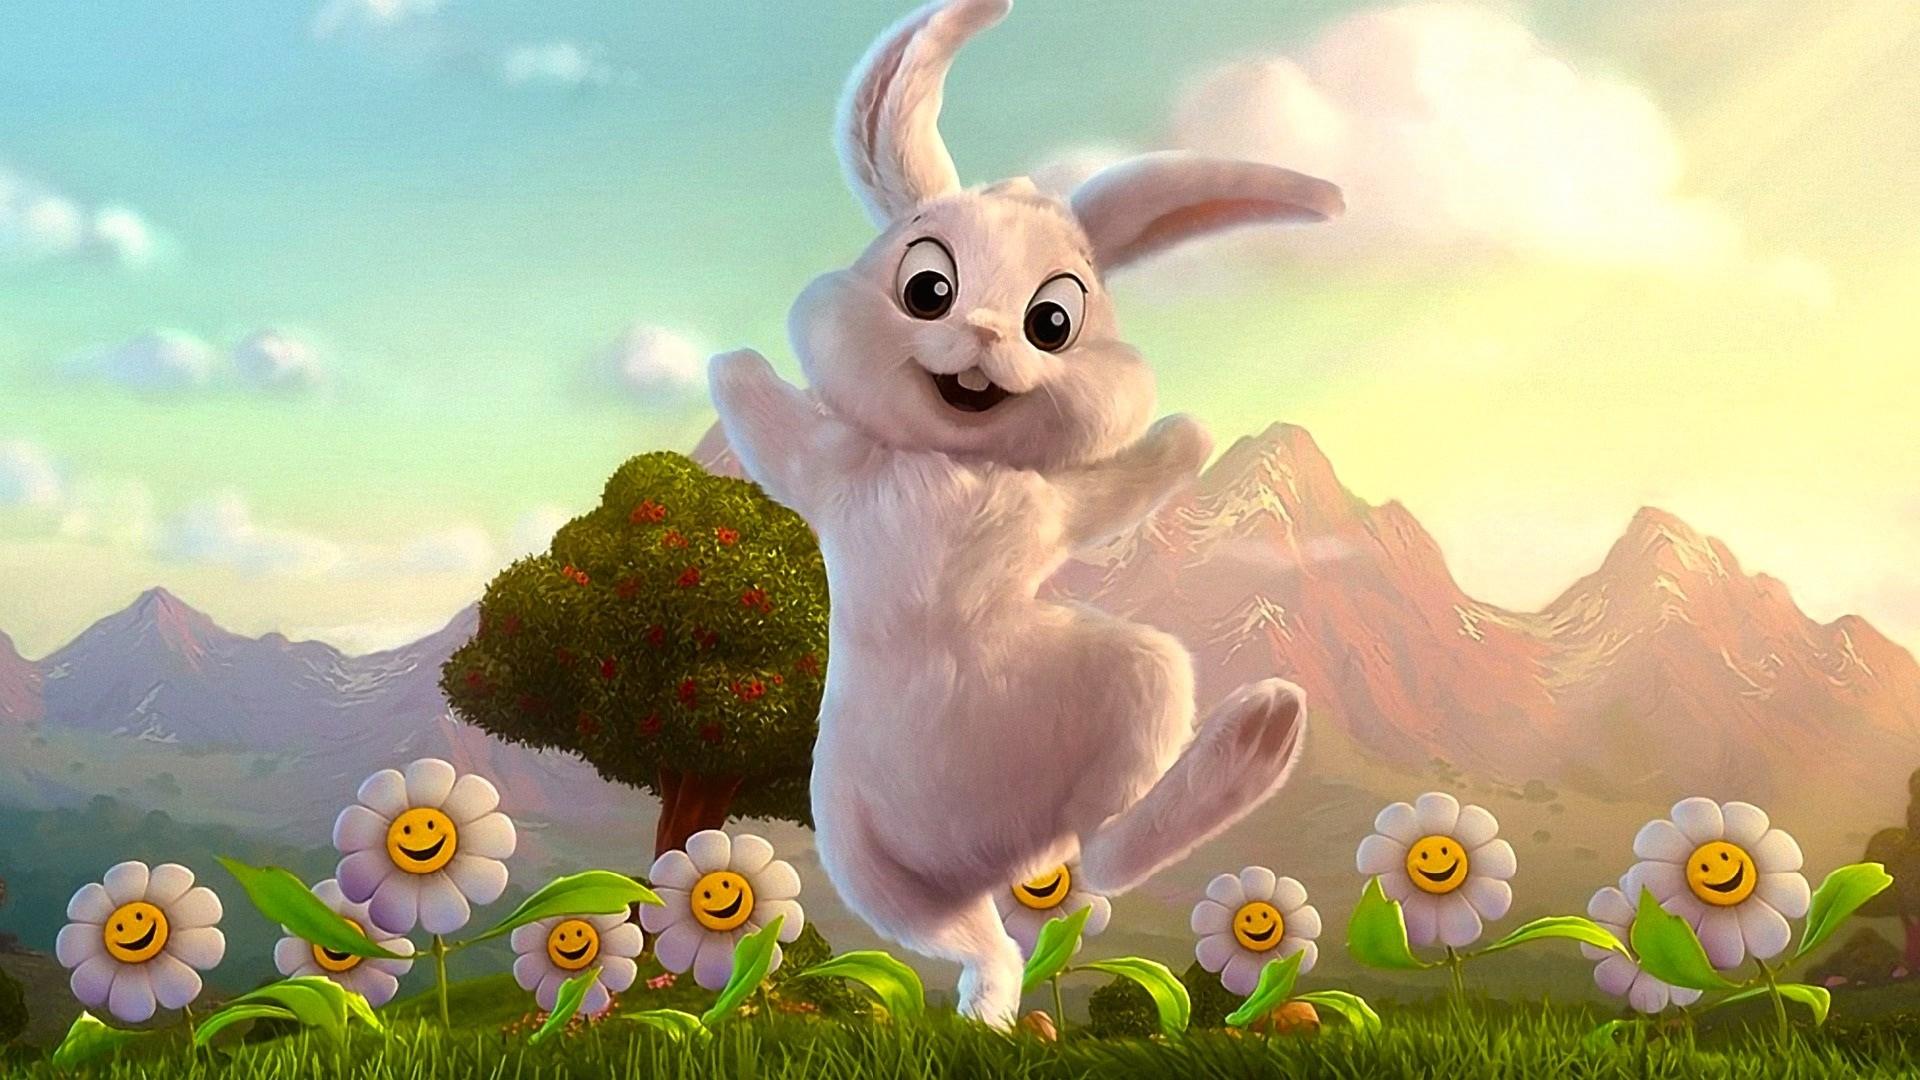 Easter Backgrounds Wallpaper (04)